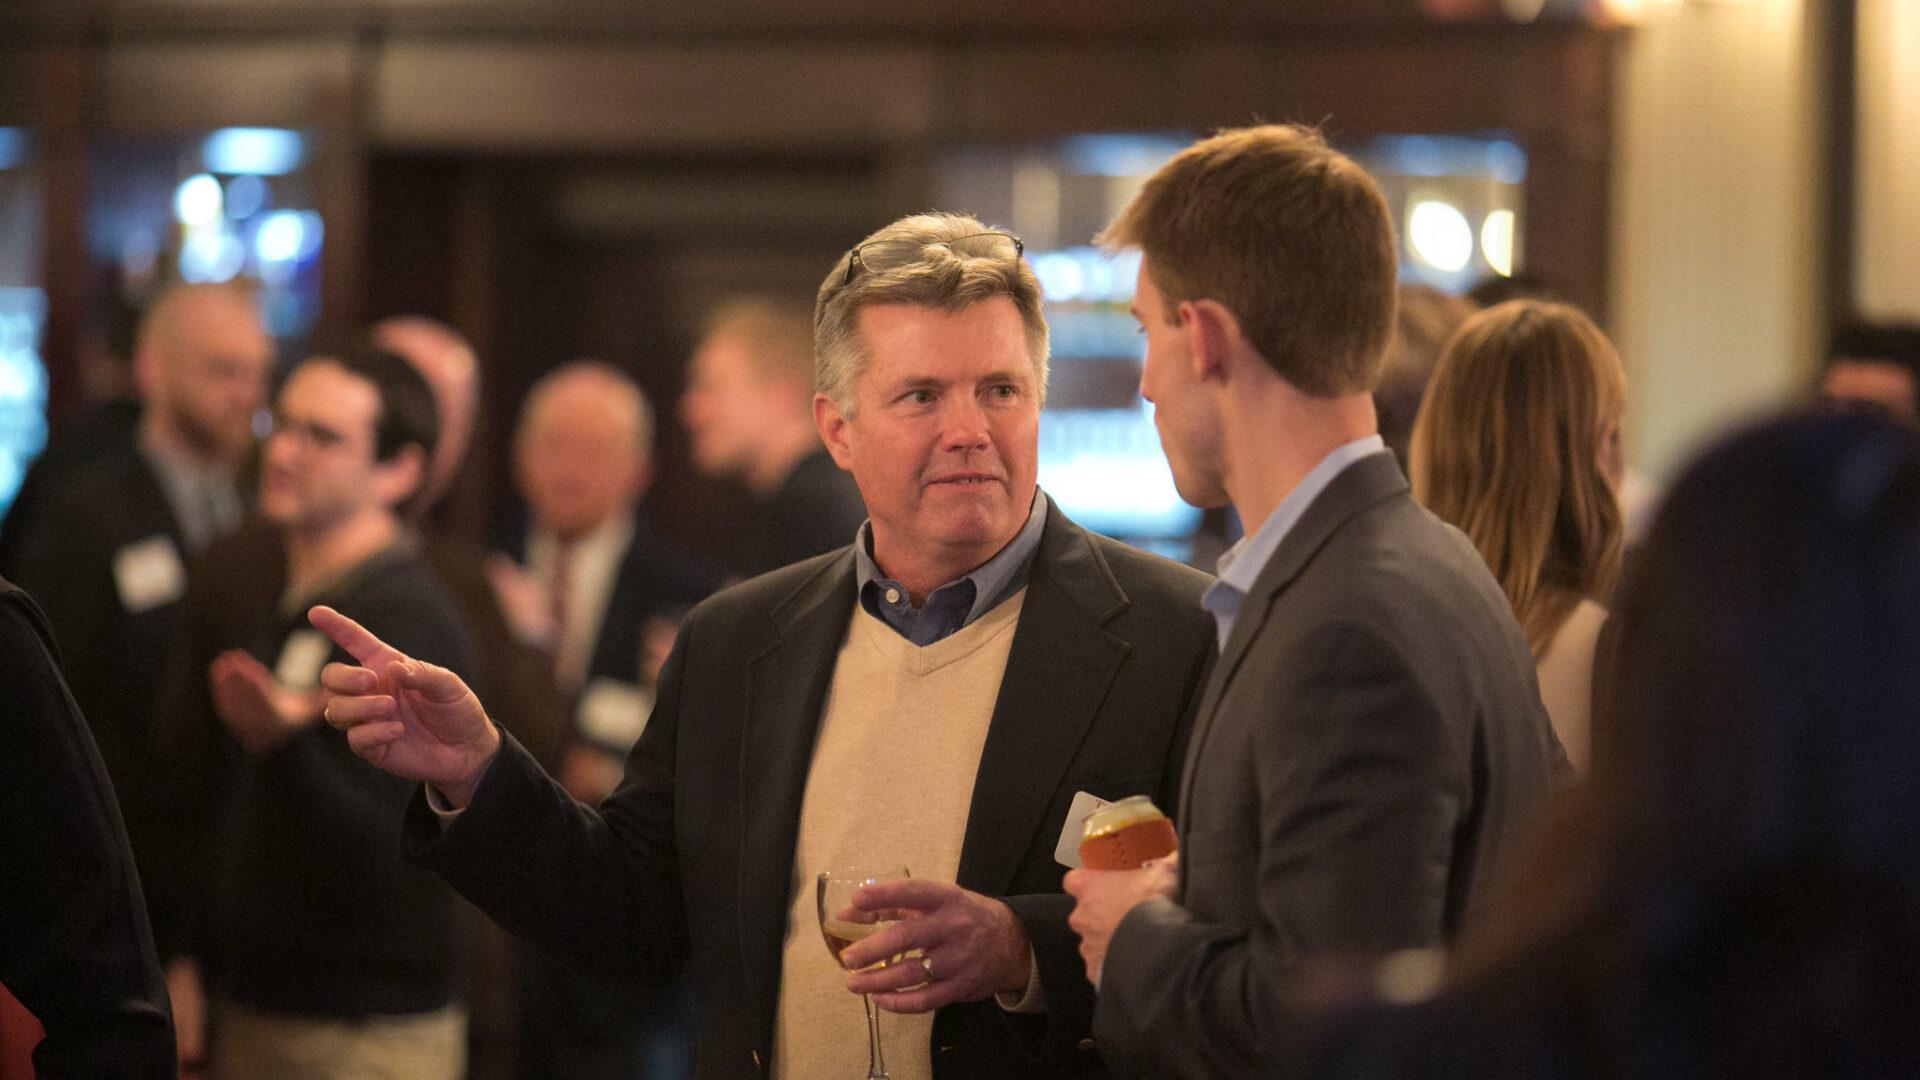 austin alumni association members chatting